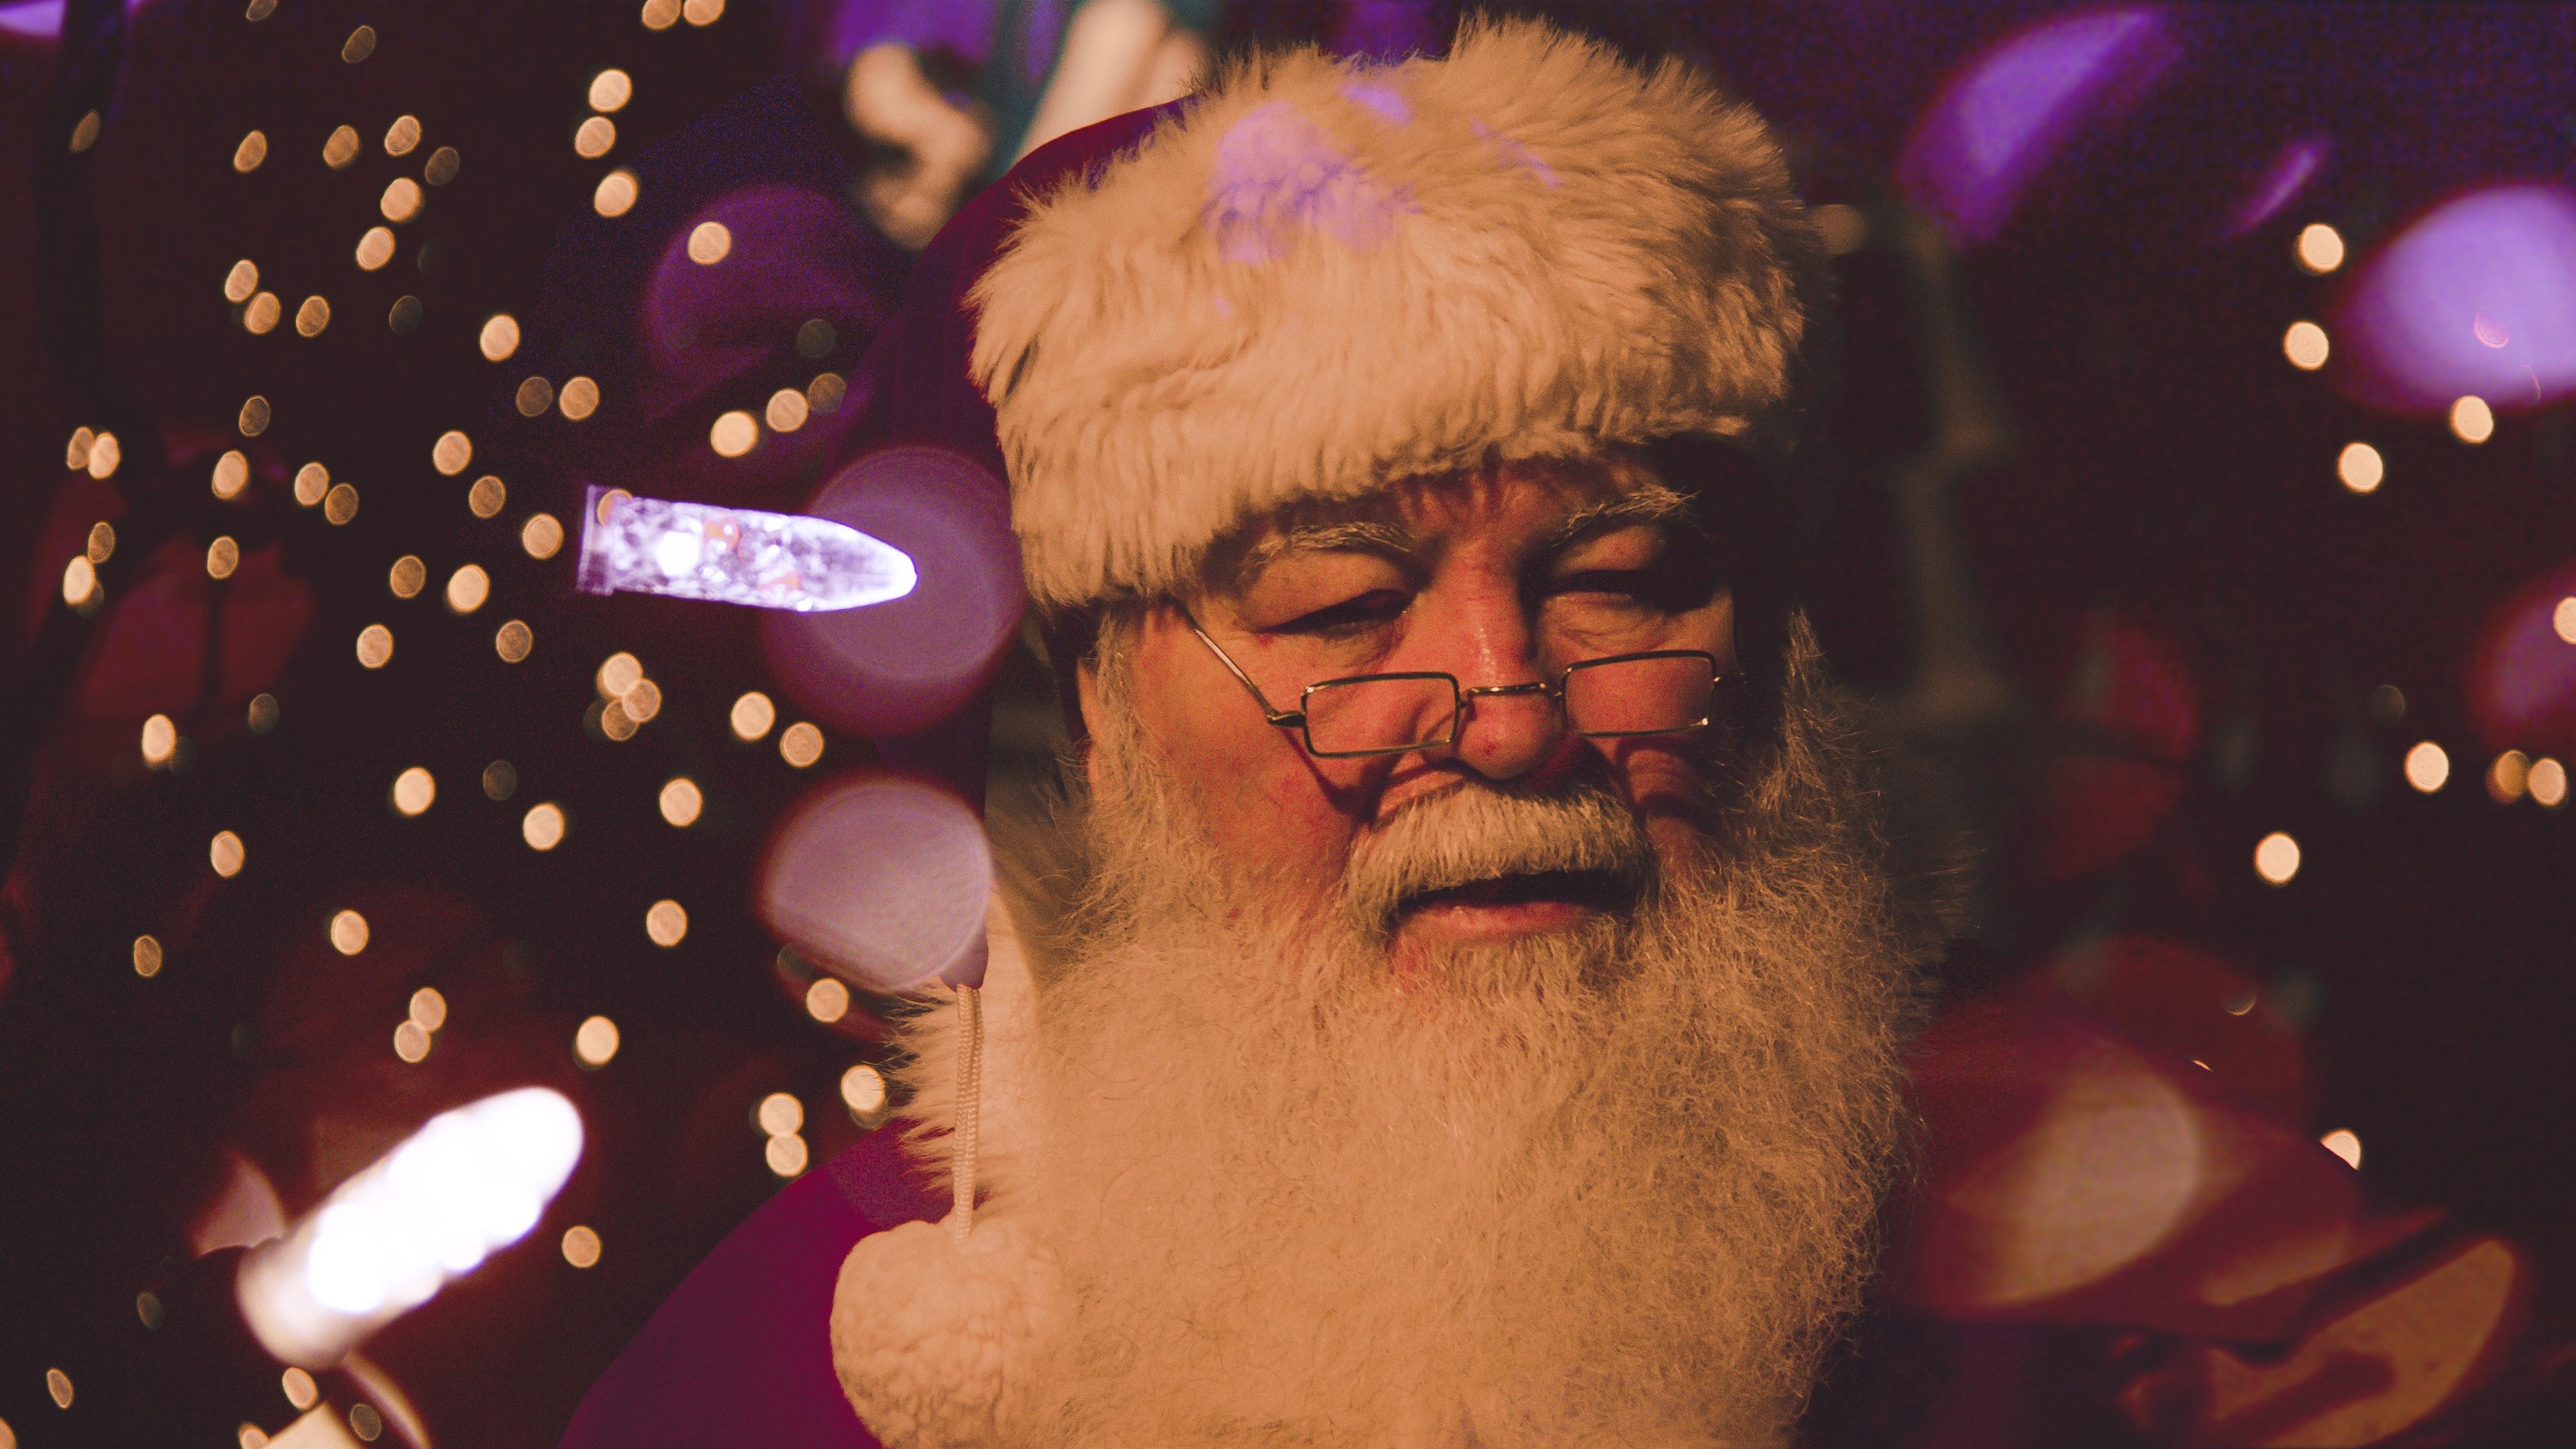 10 Things That Make Christmas Christmas